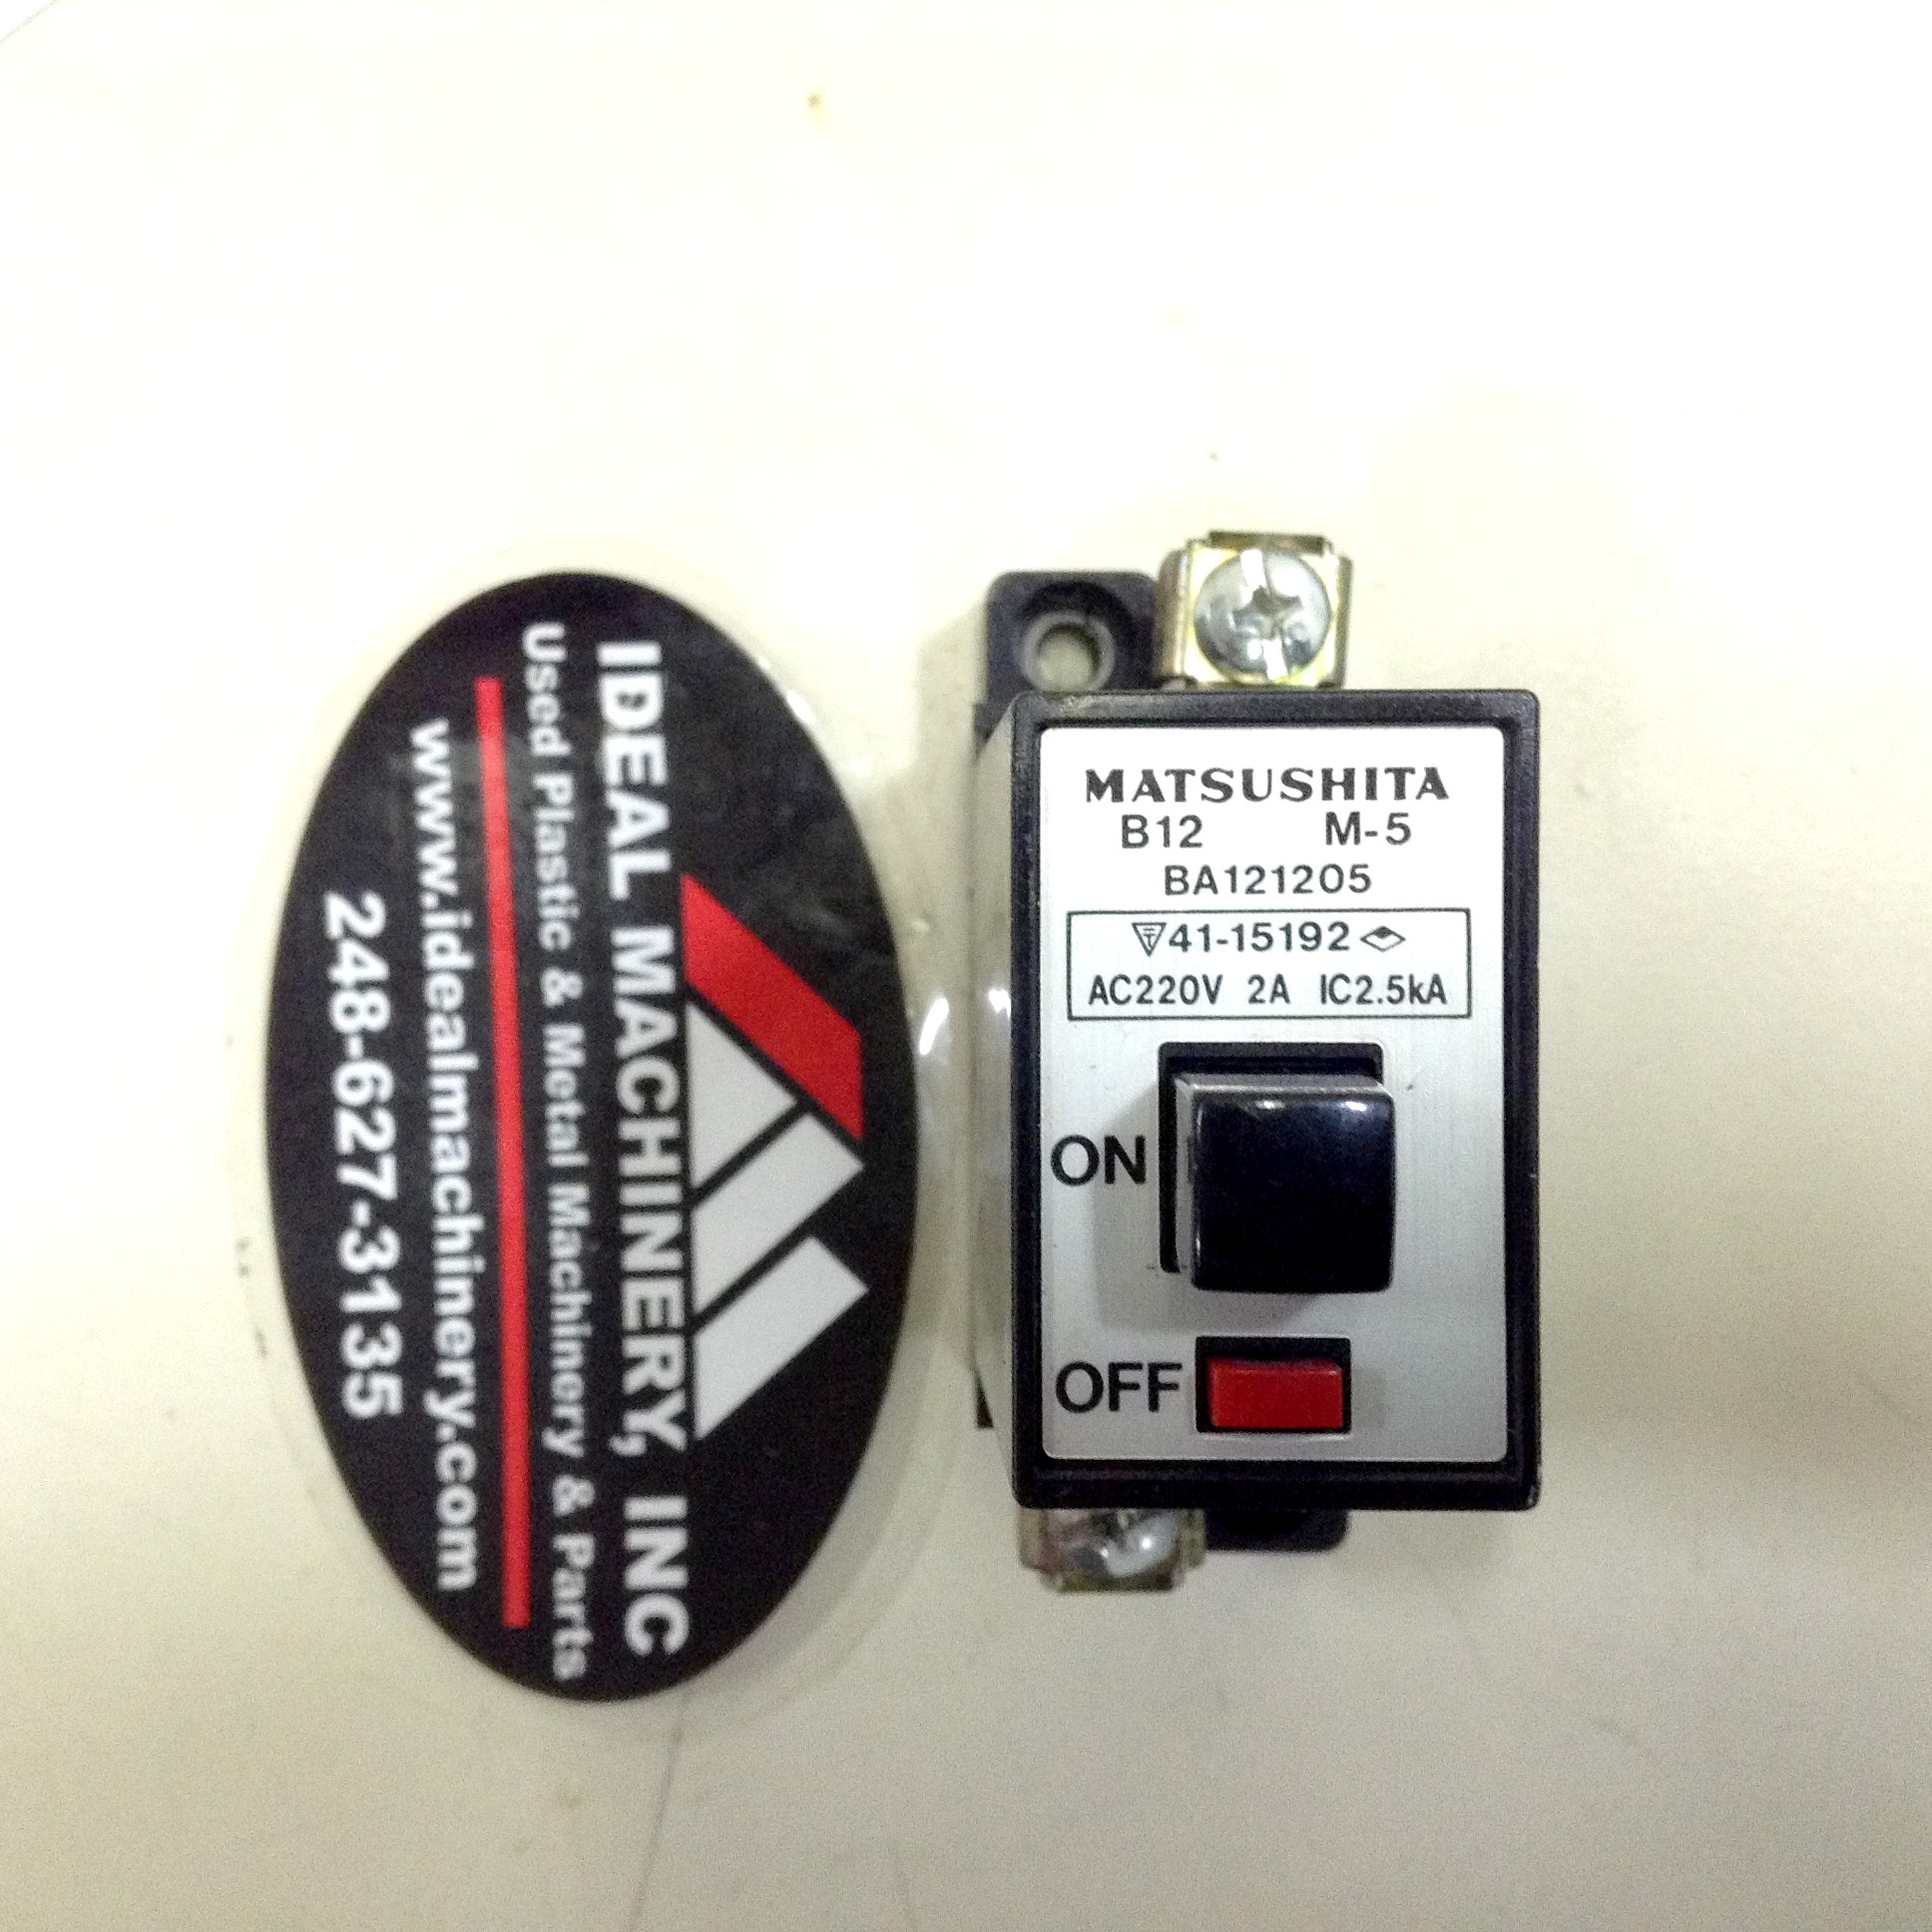 Matsushita Electric B12 M-5